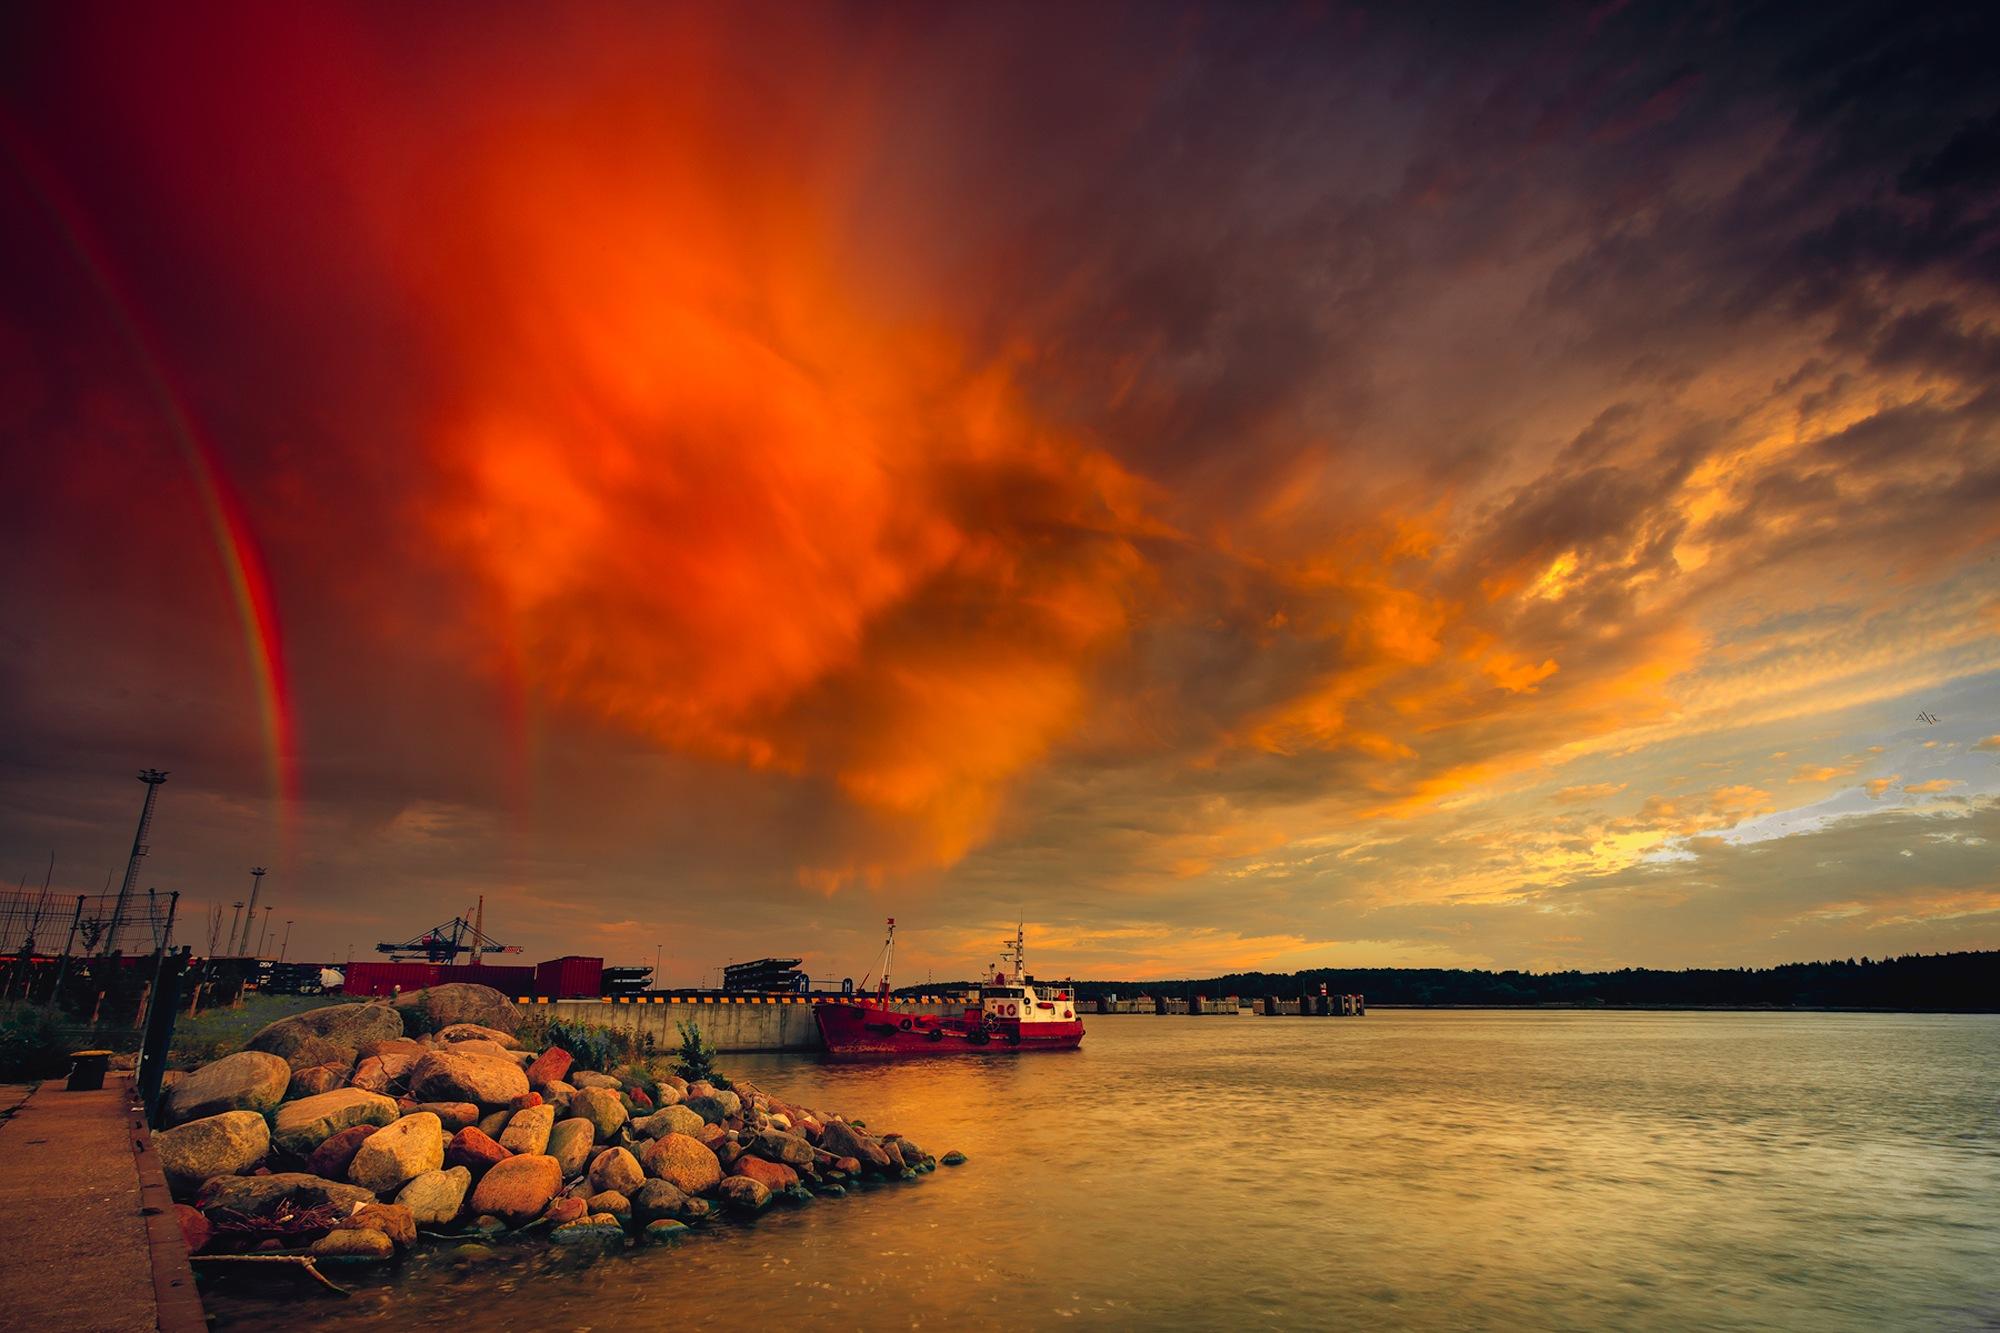 Sky Dances  by Ruslan  Bolgov (Axe Photography)